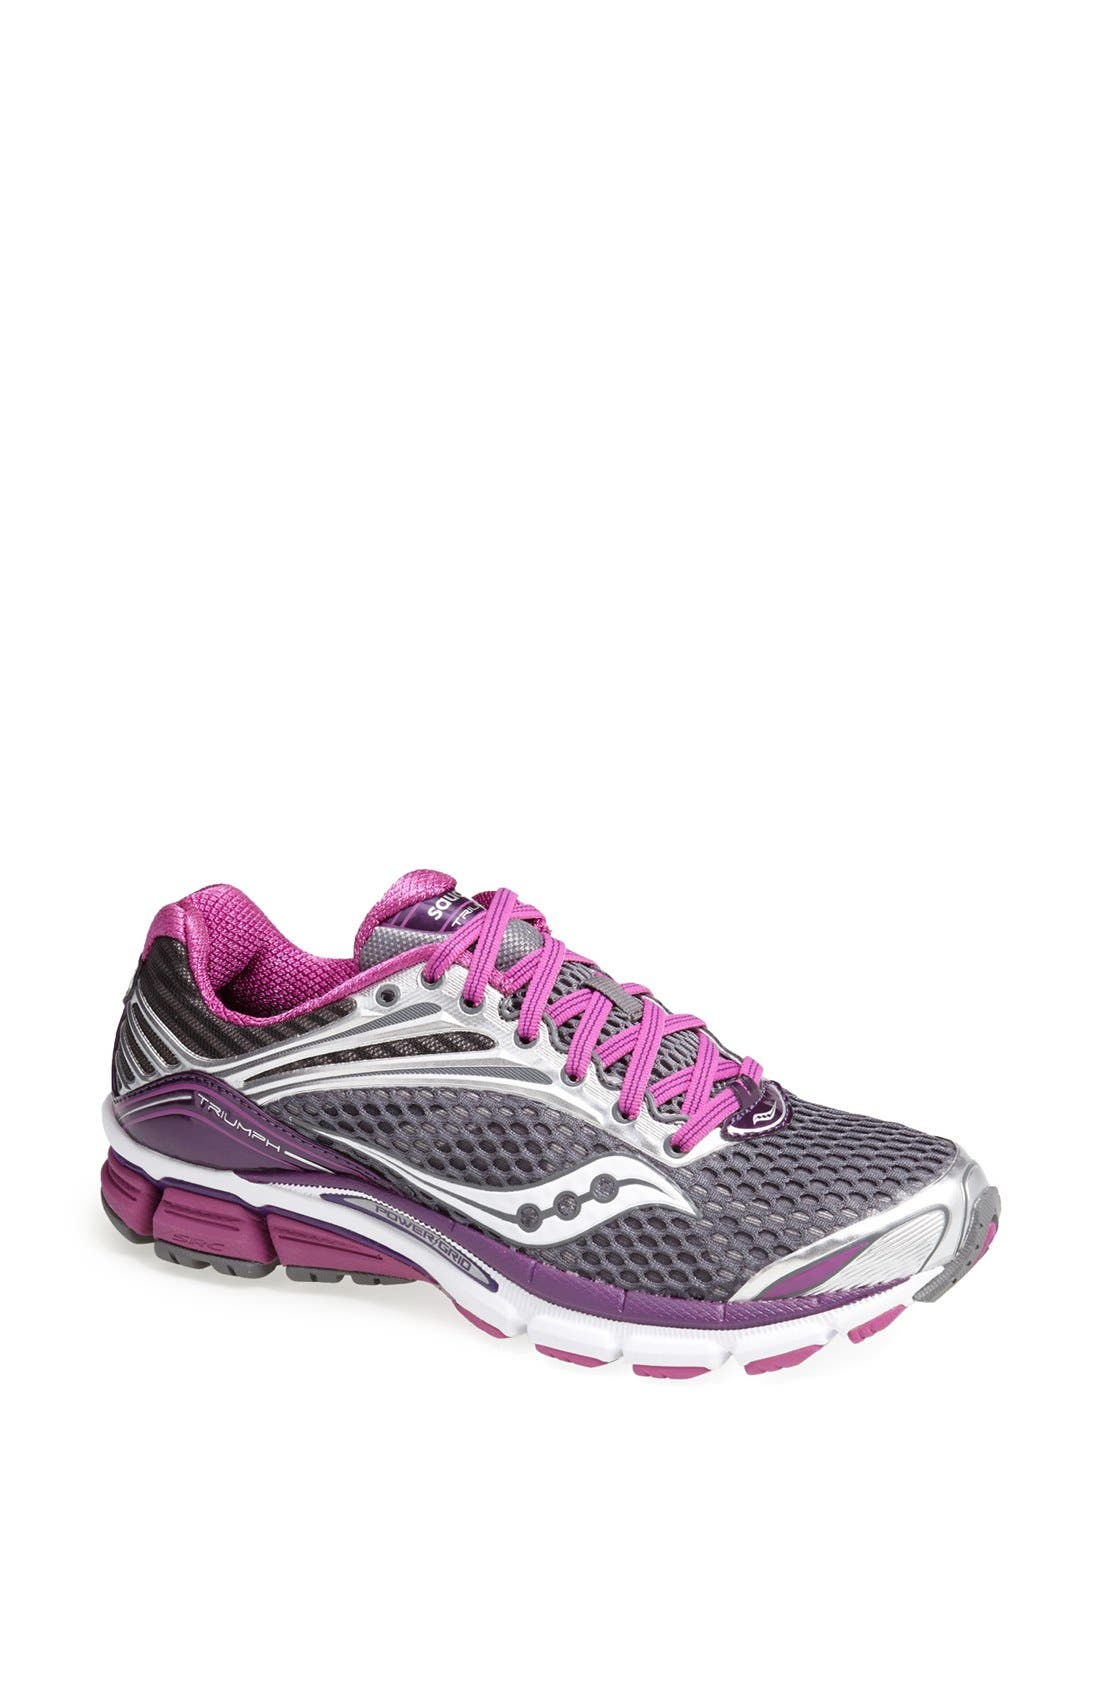 Main Image - Saucony 'Triumph 11' Running Shoe (Women)